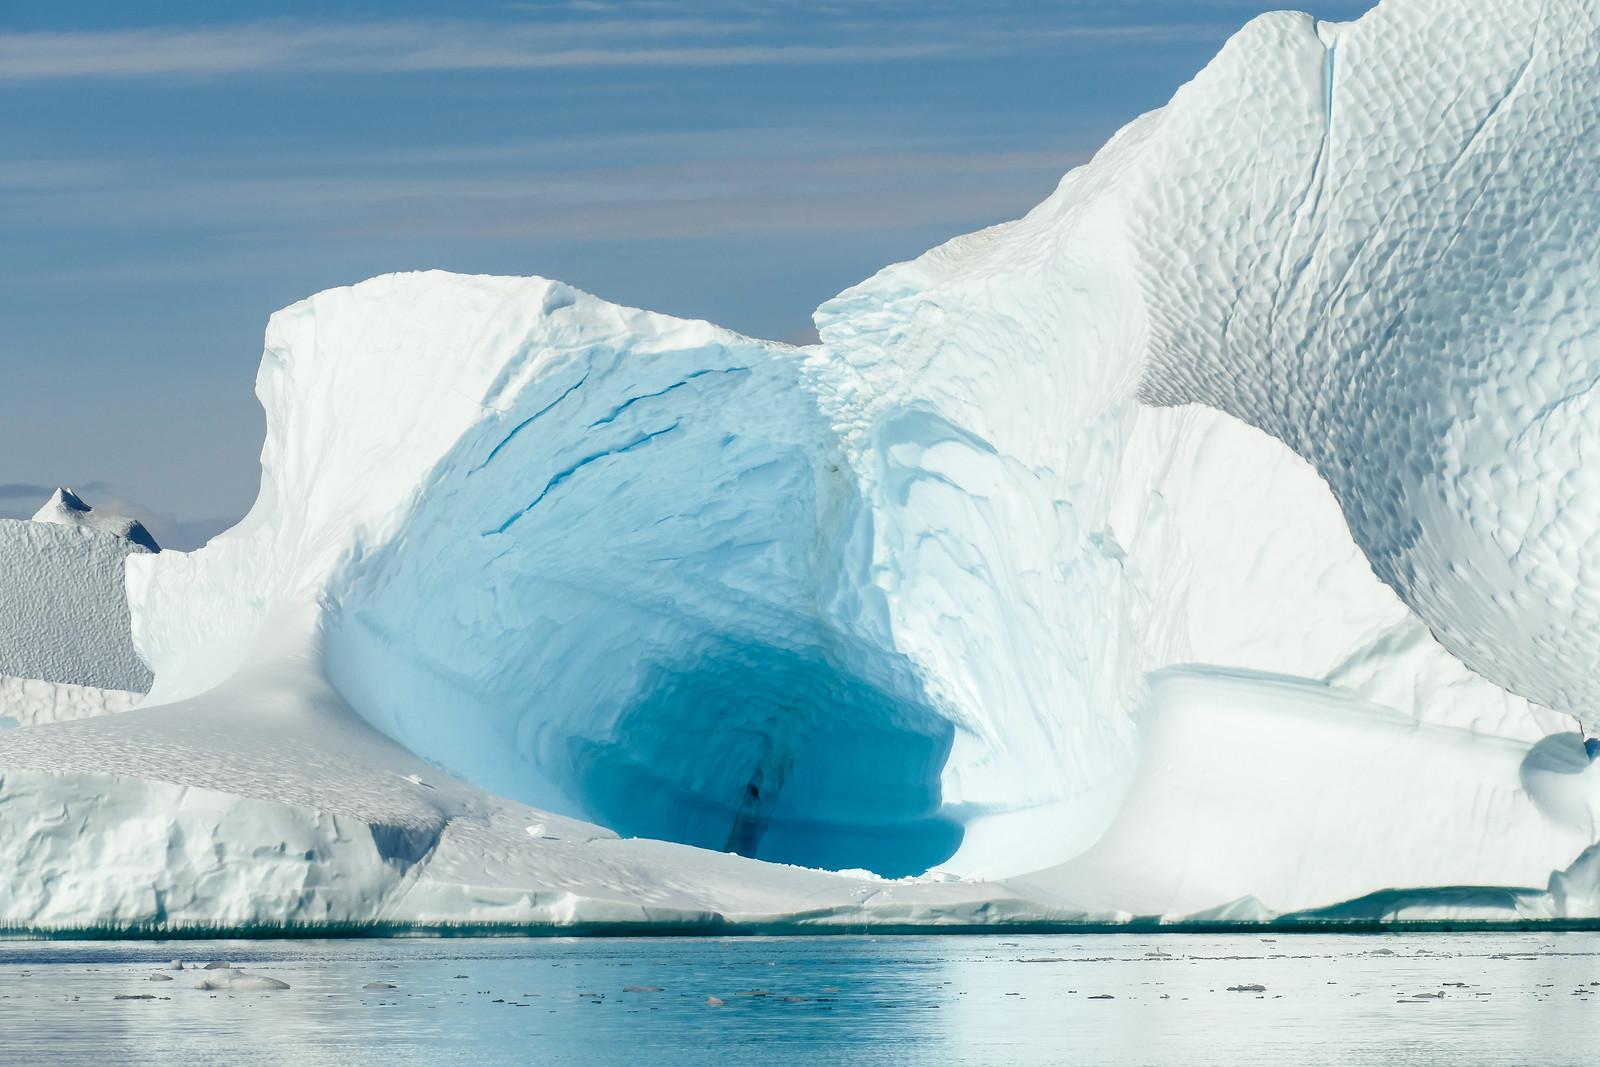 An ice cave in an iceberg